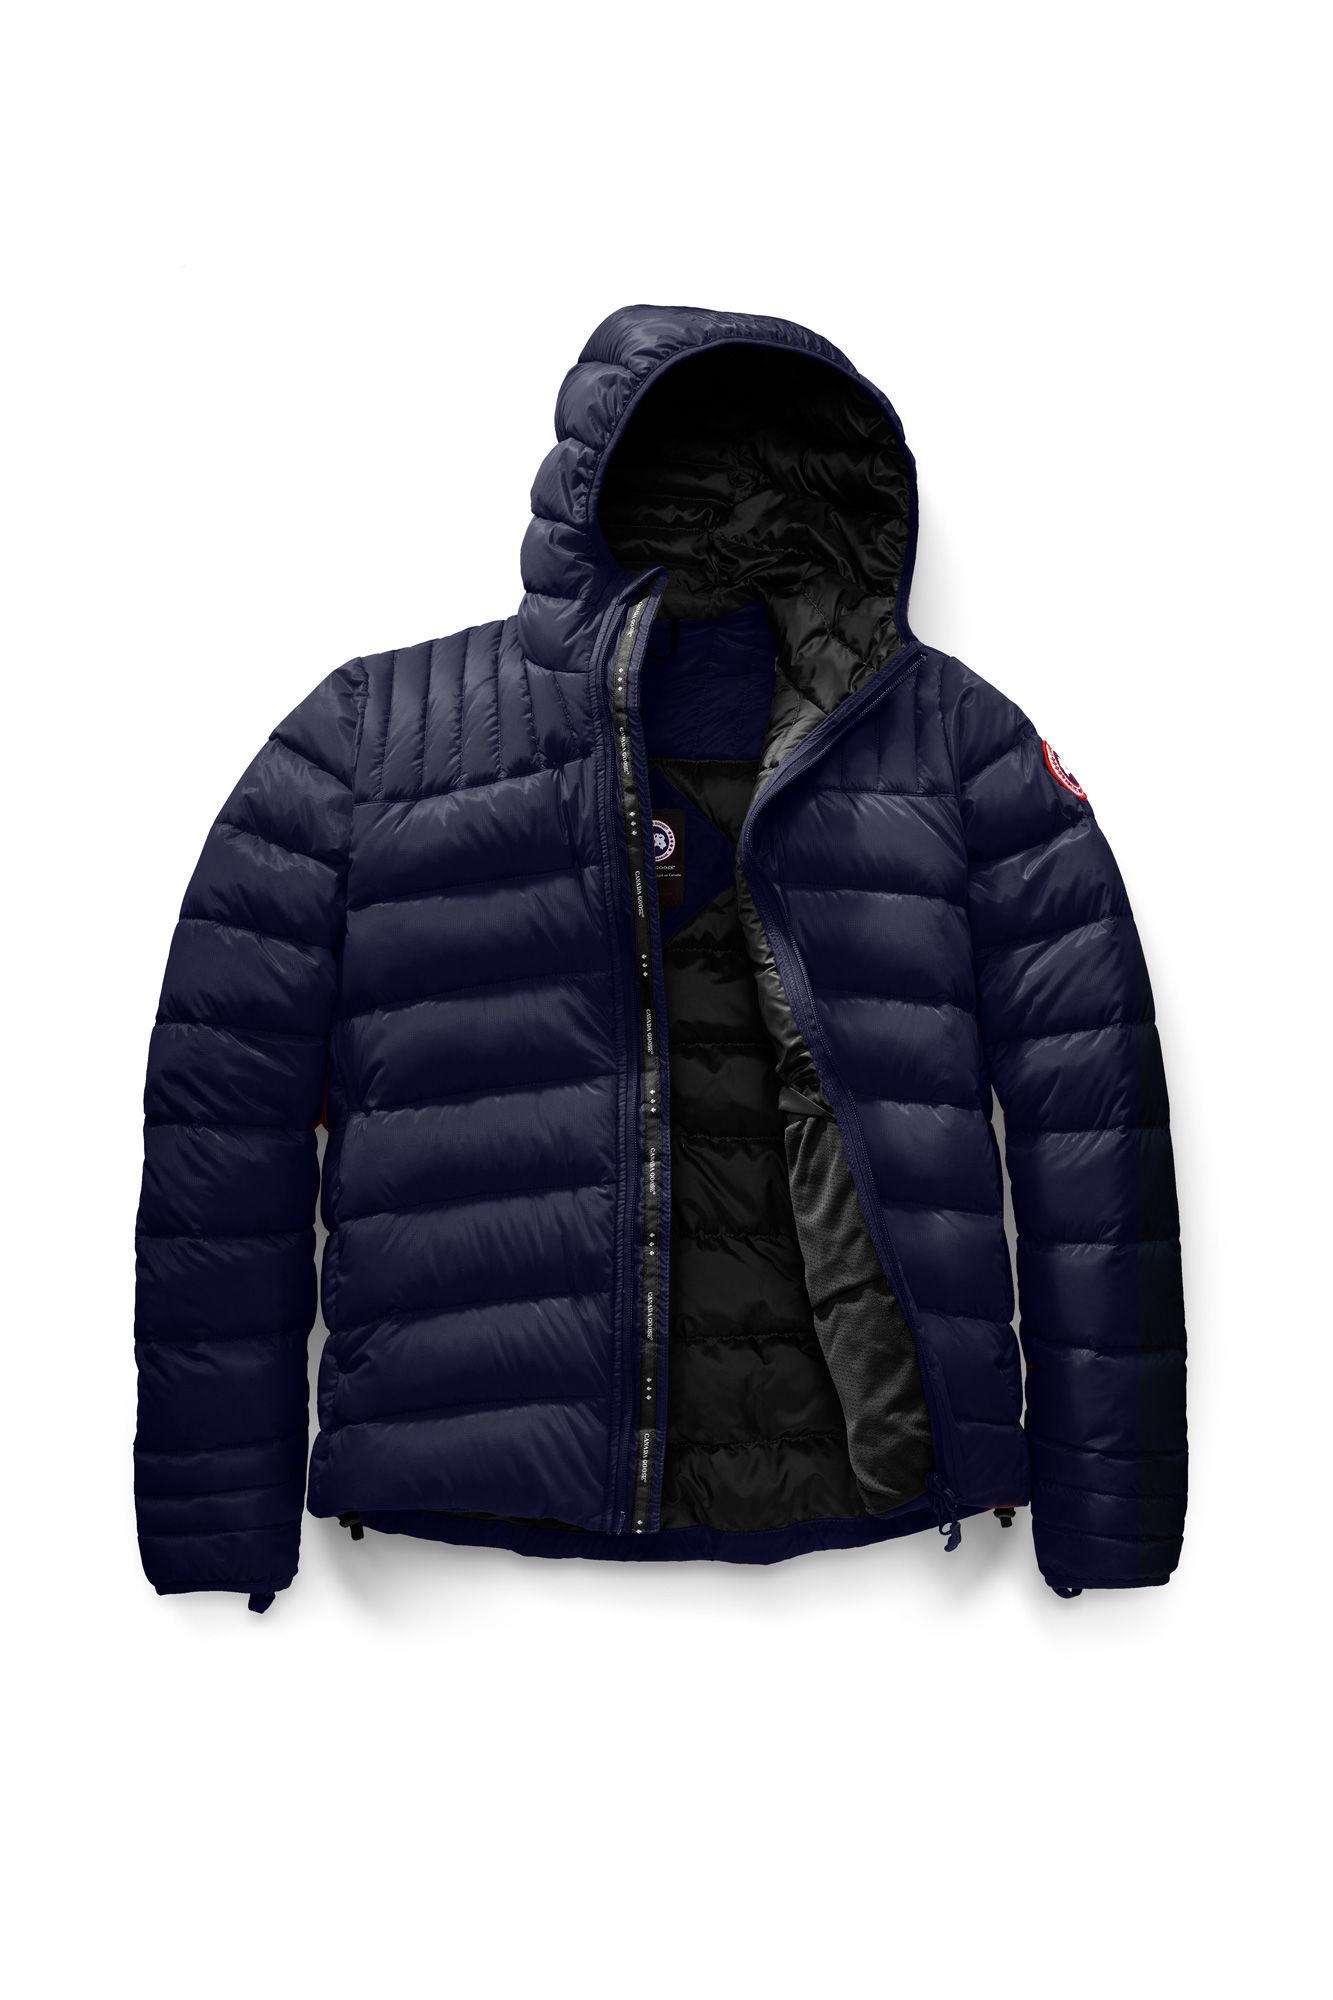 7facbcead Top Designer Qualities Deep Sea Blue/Black Canada Goose Lightweight Down  Jackets Brookvale Hoody Canada Goose Chilliwack Black Friday 5501M